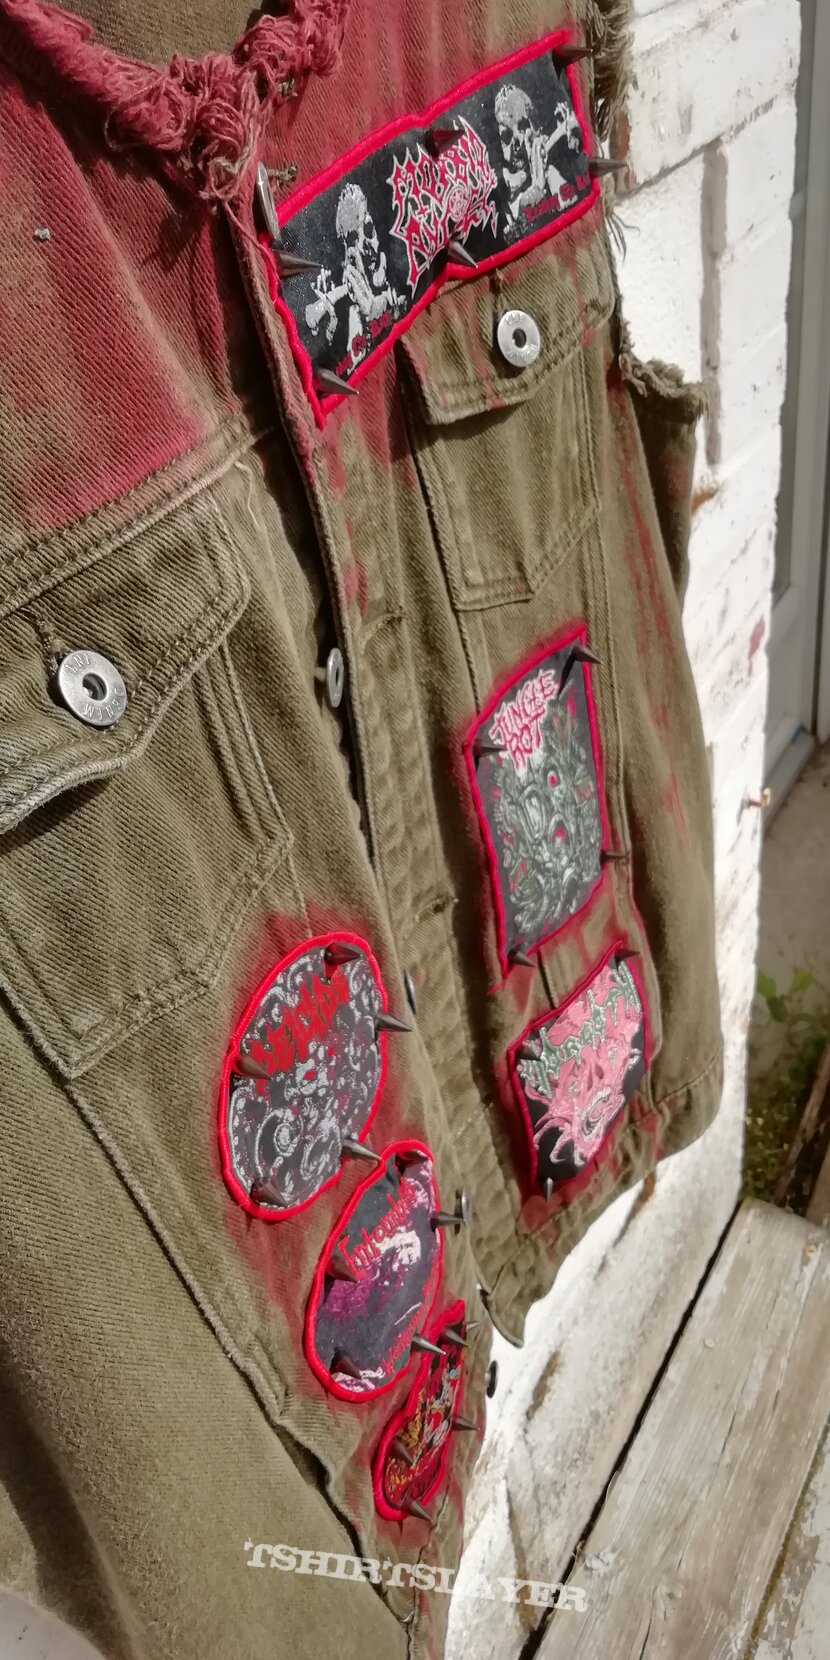 The Bloody Death Battle Jacket